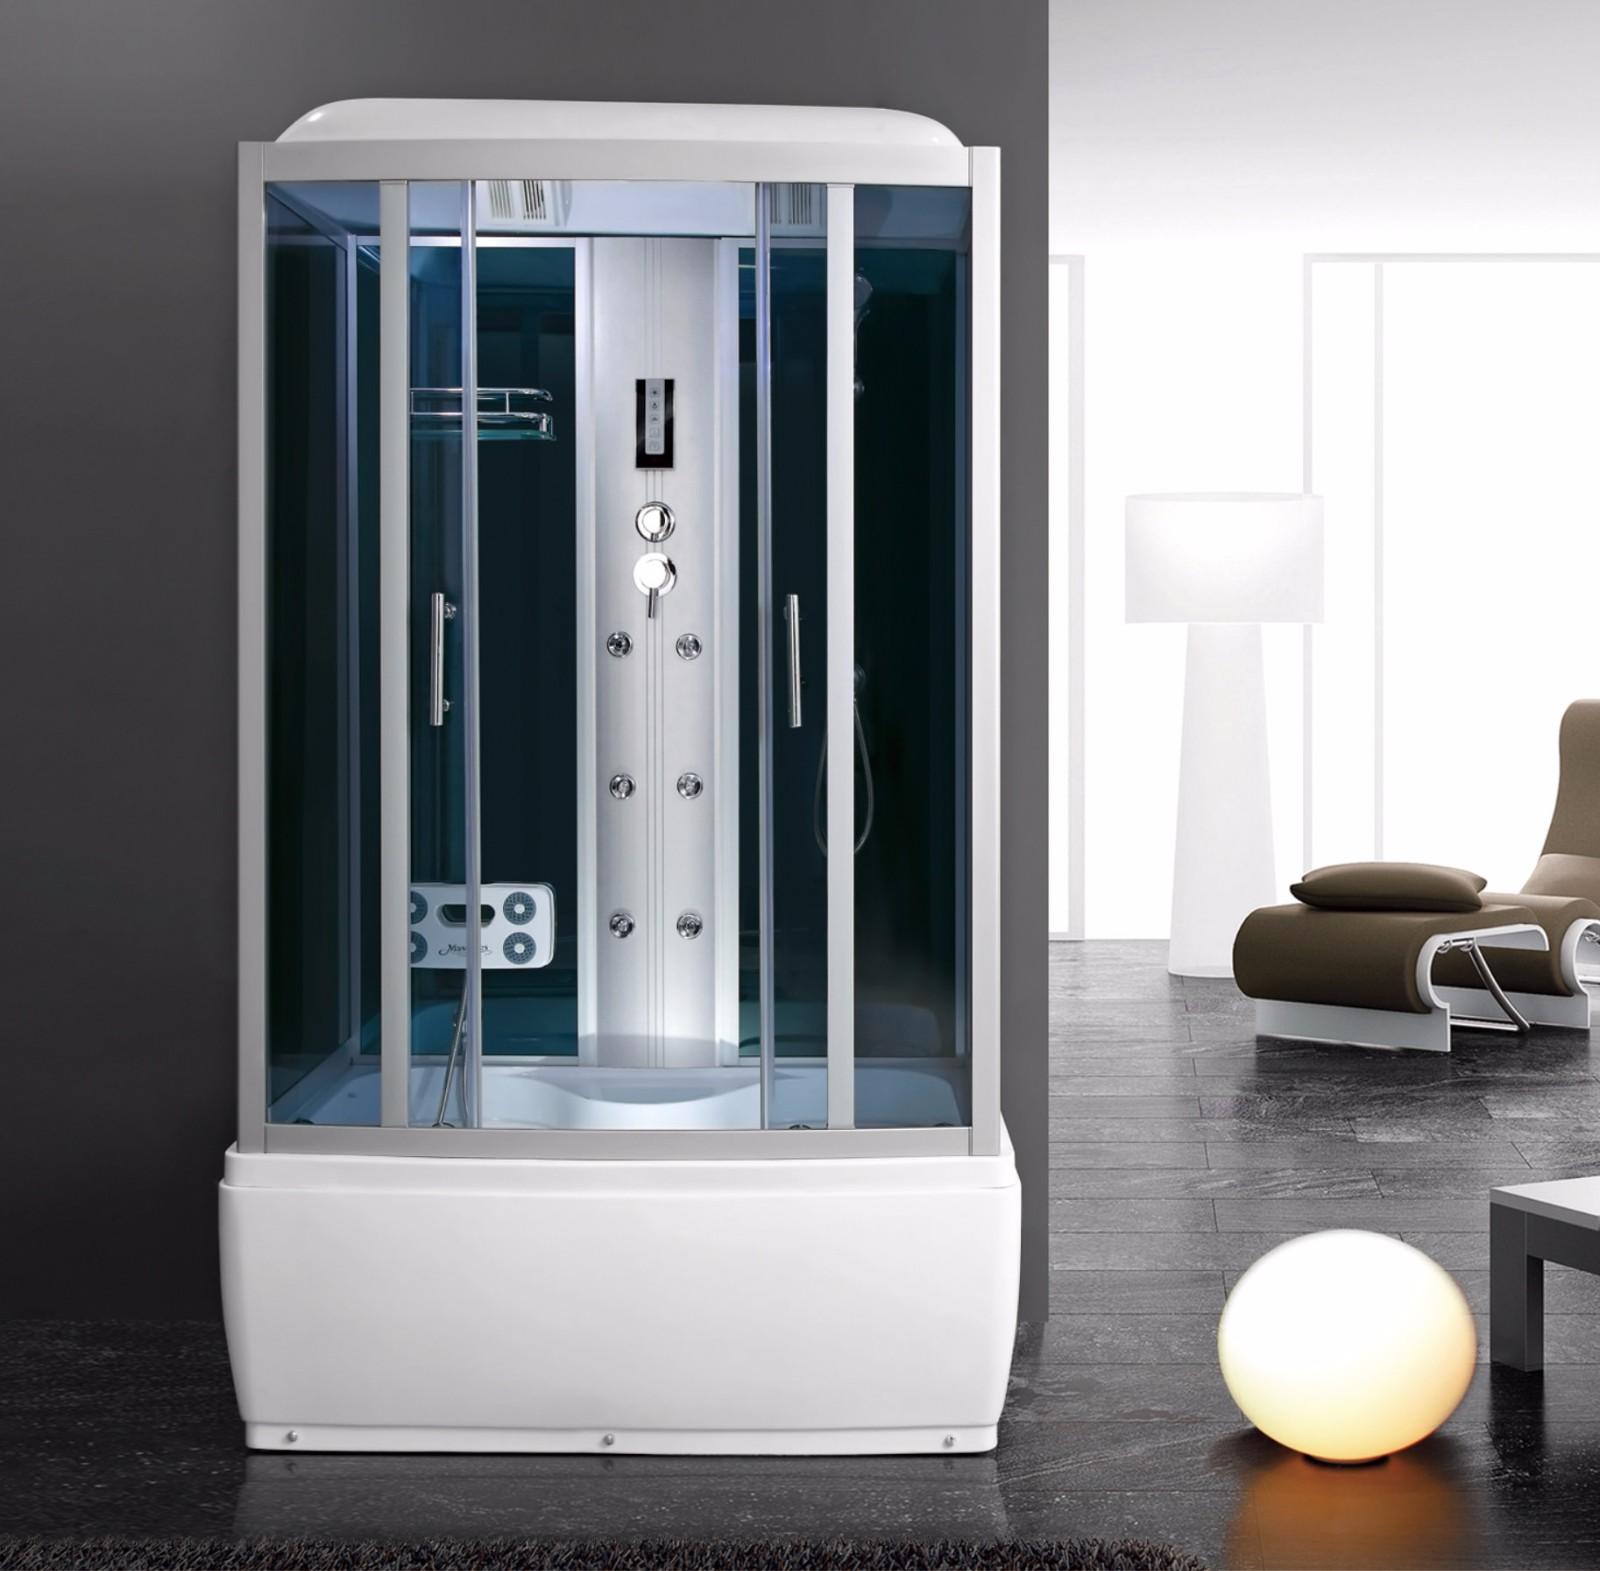 M-510-AS Shower Unit Steam Enclosure with Bathtub Sliding Door for Sale.jpg